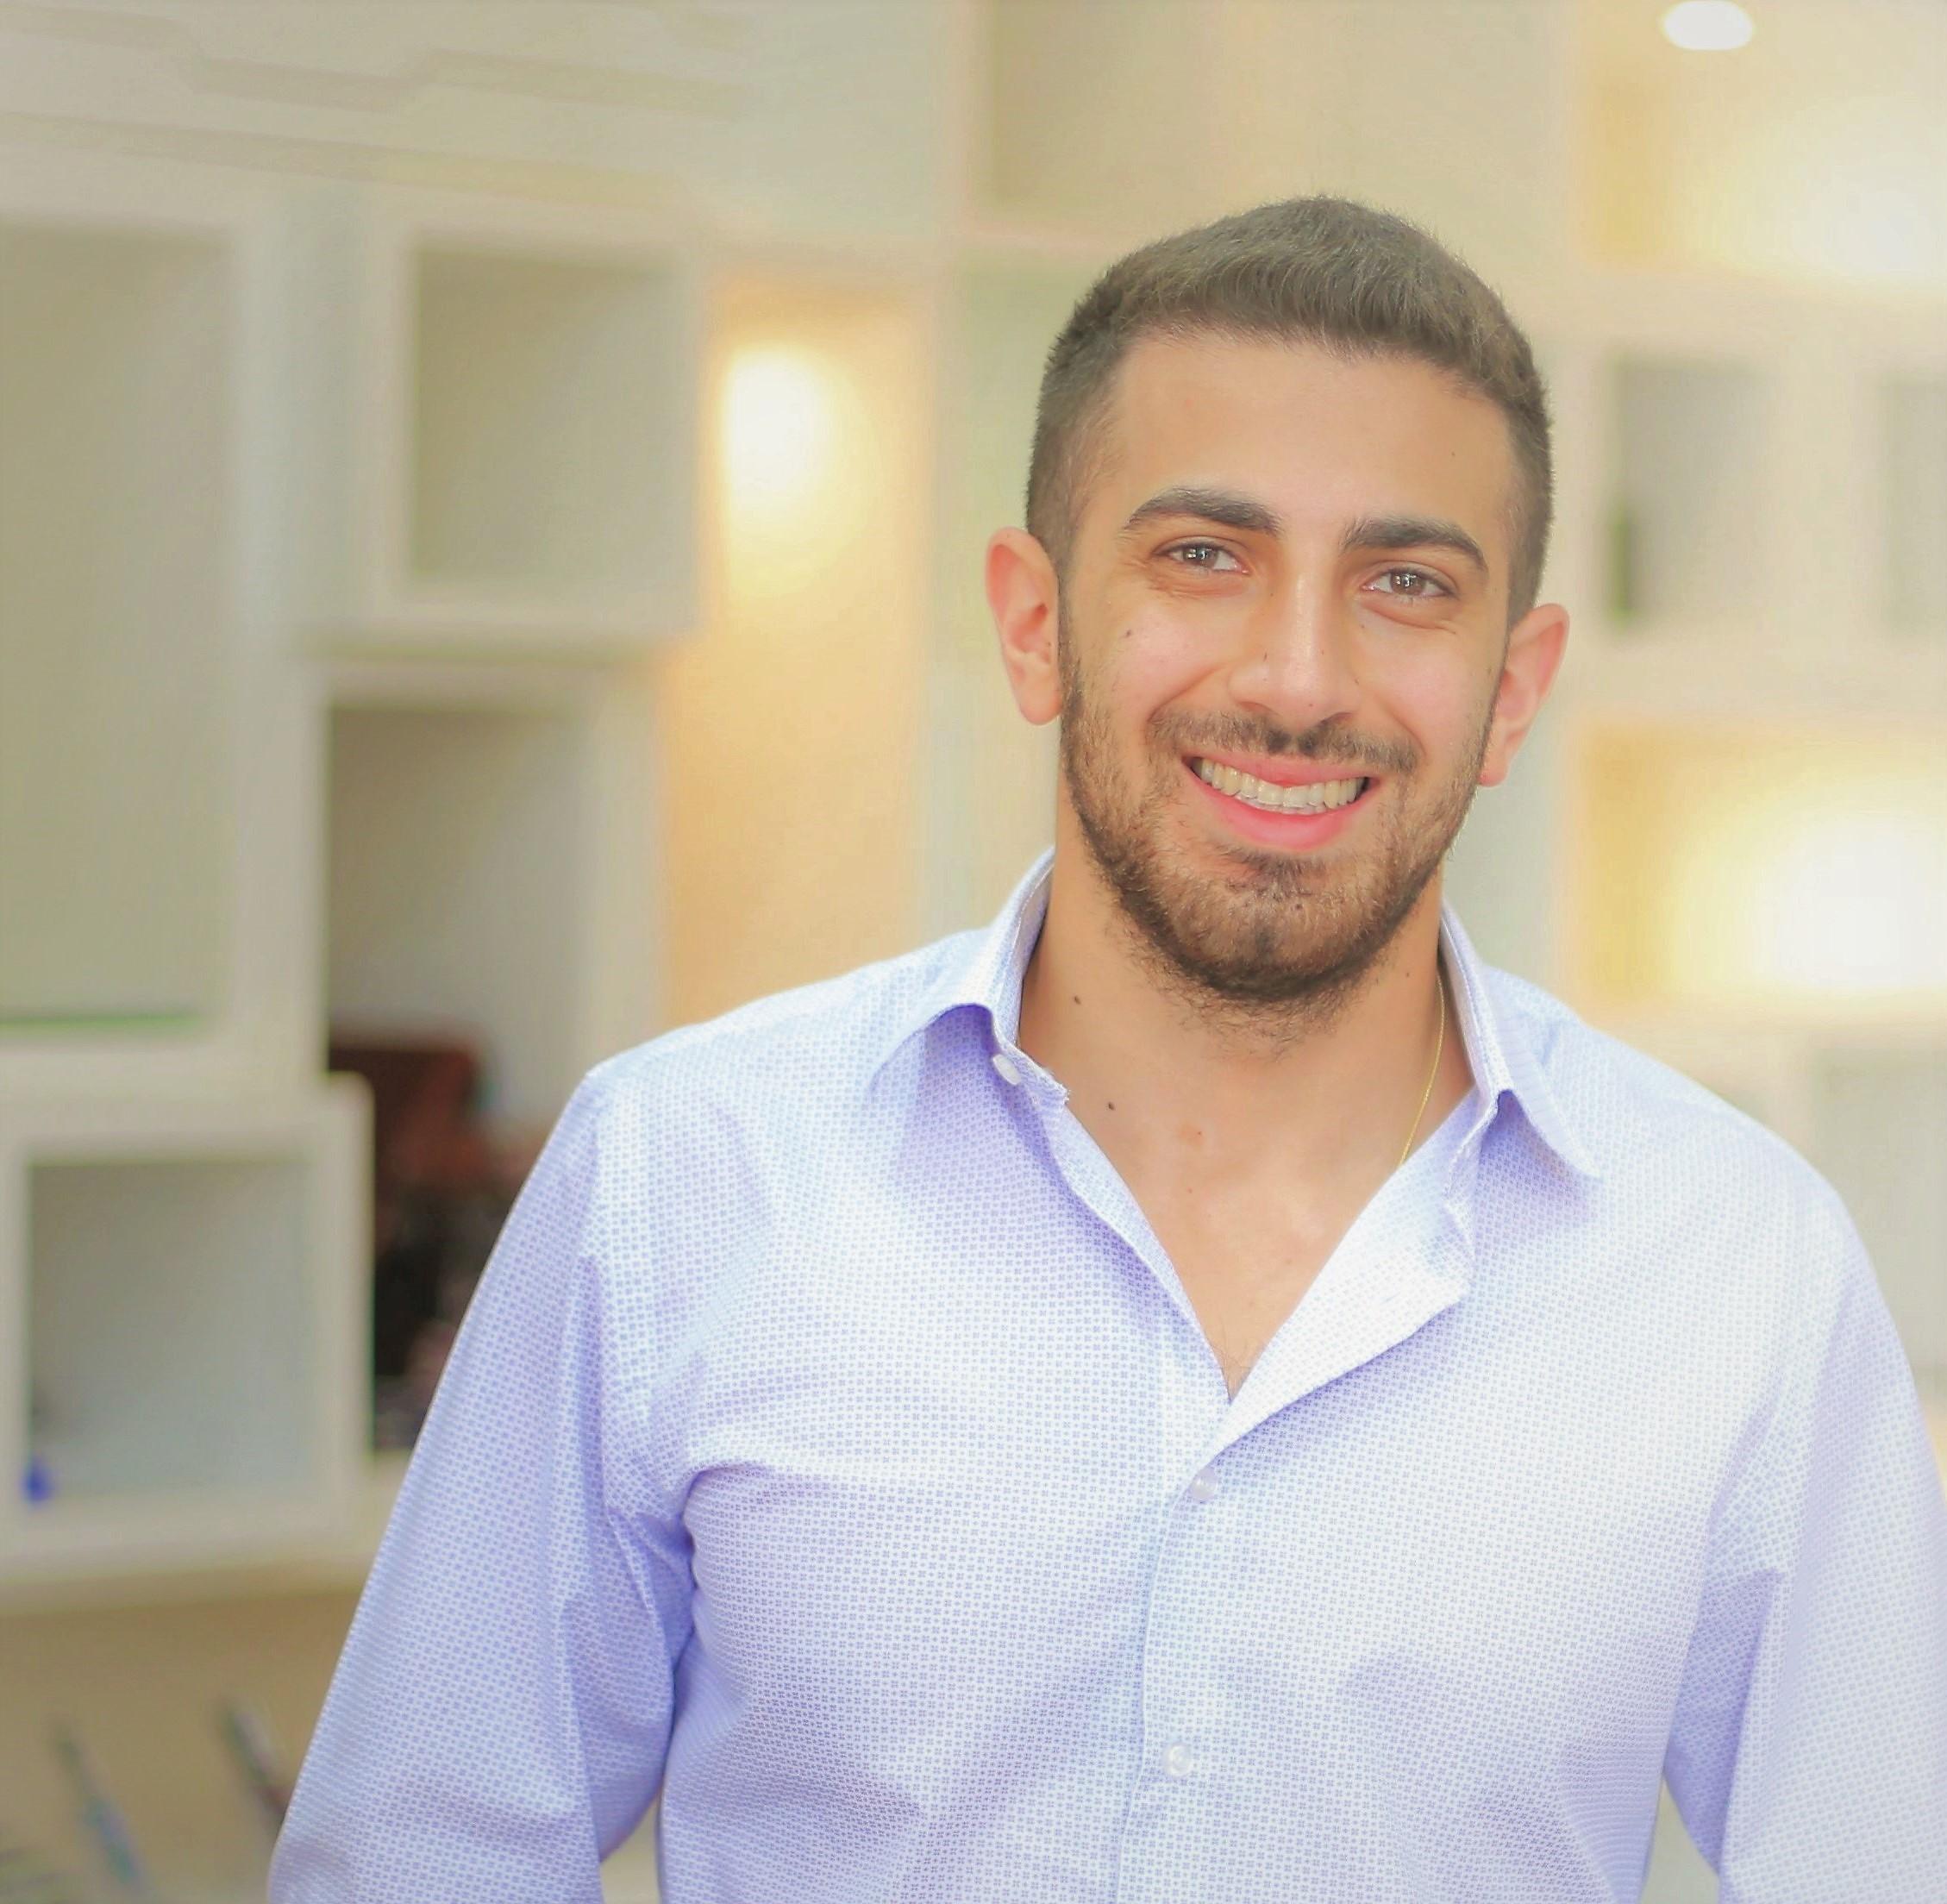 Yacoub Zureikat